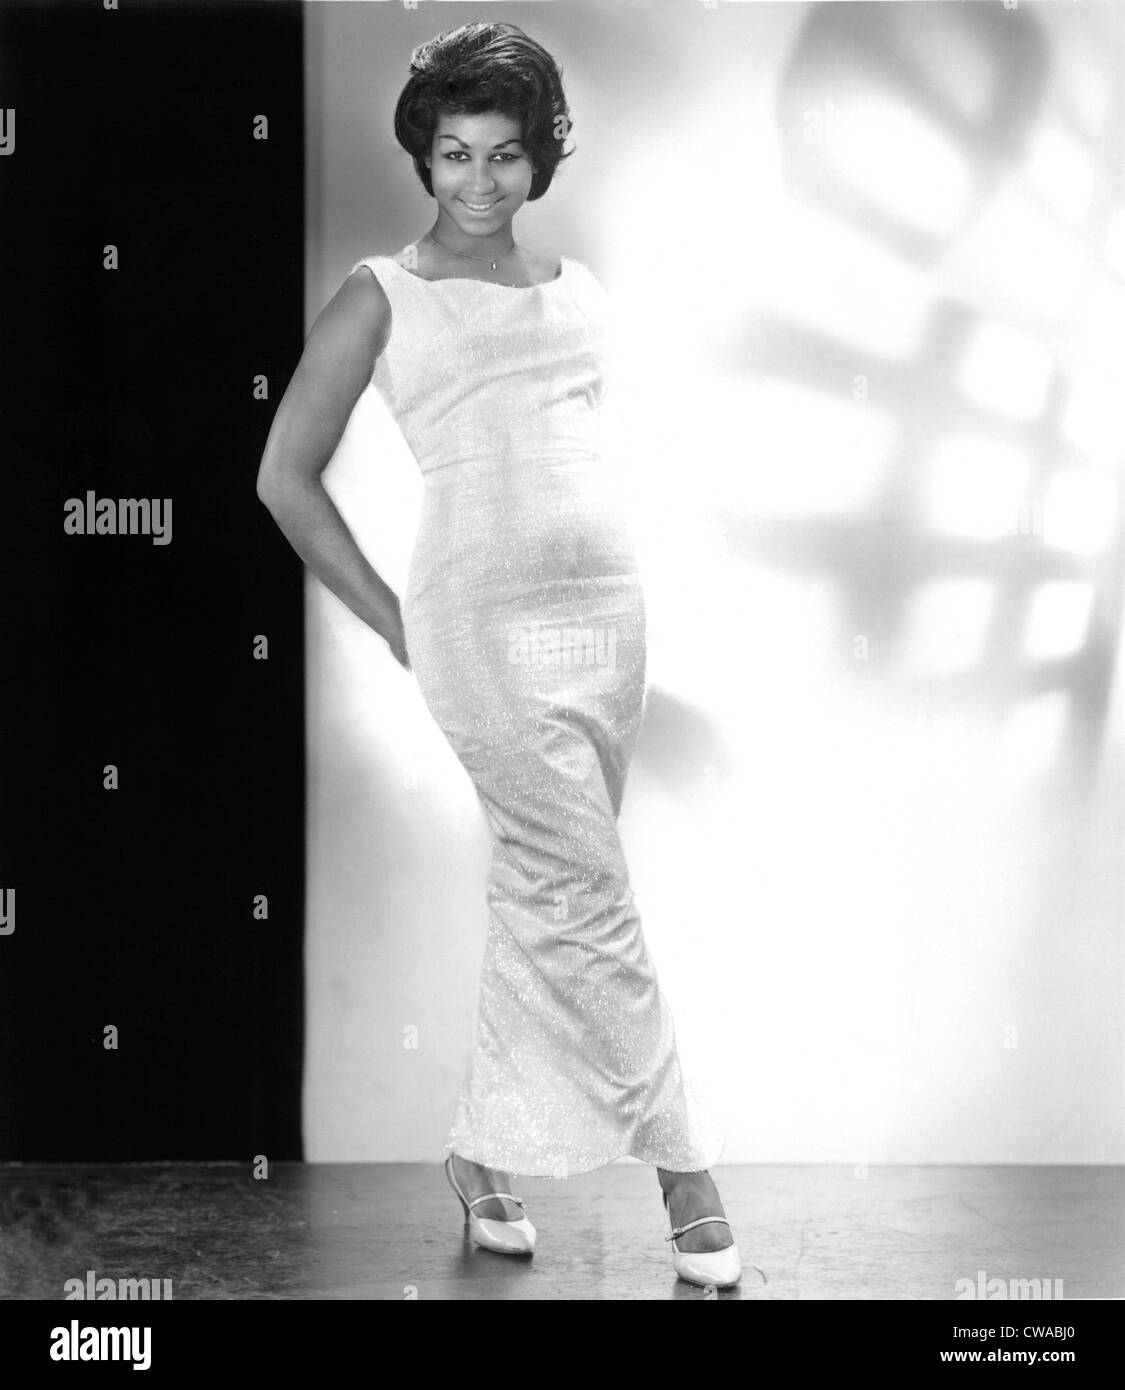 ARETHA FRANKLIN, 1965, Columbia Records publicity portrait. CSU Archives/Everett Collection. - Stock Image